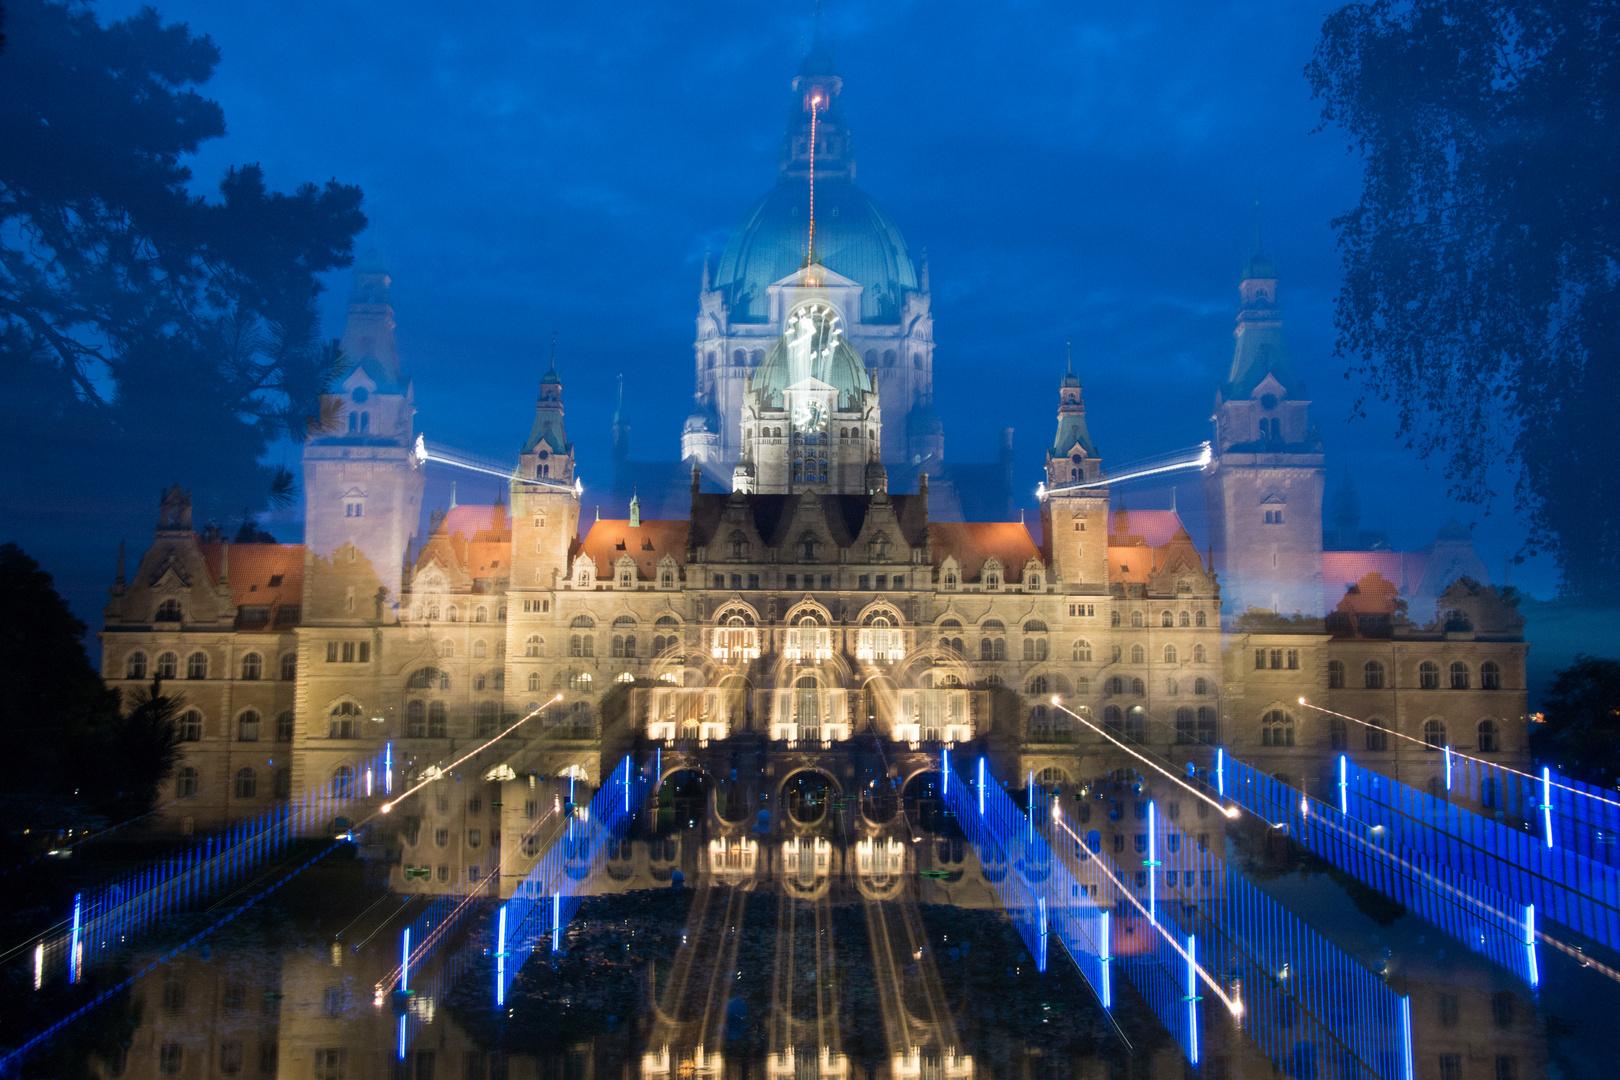 Das Neue Rathaus in Hannover, einmal anders